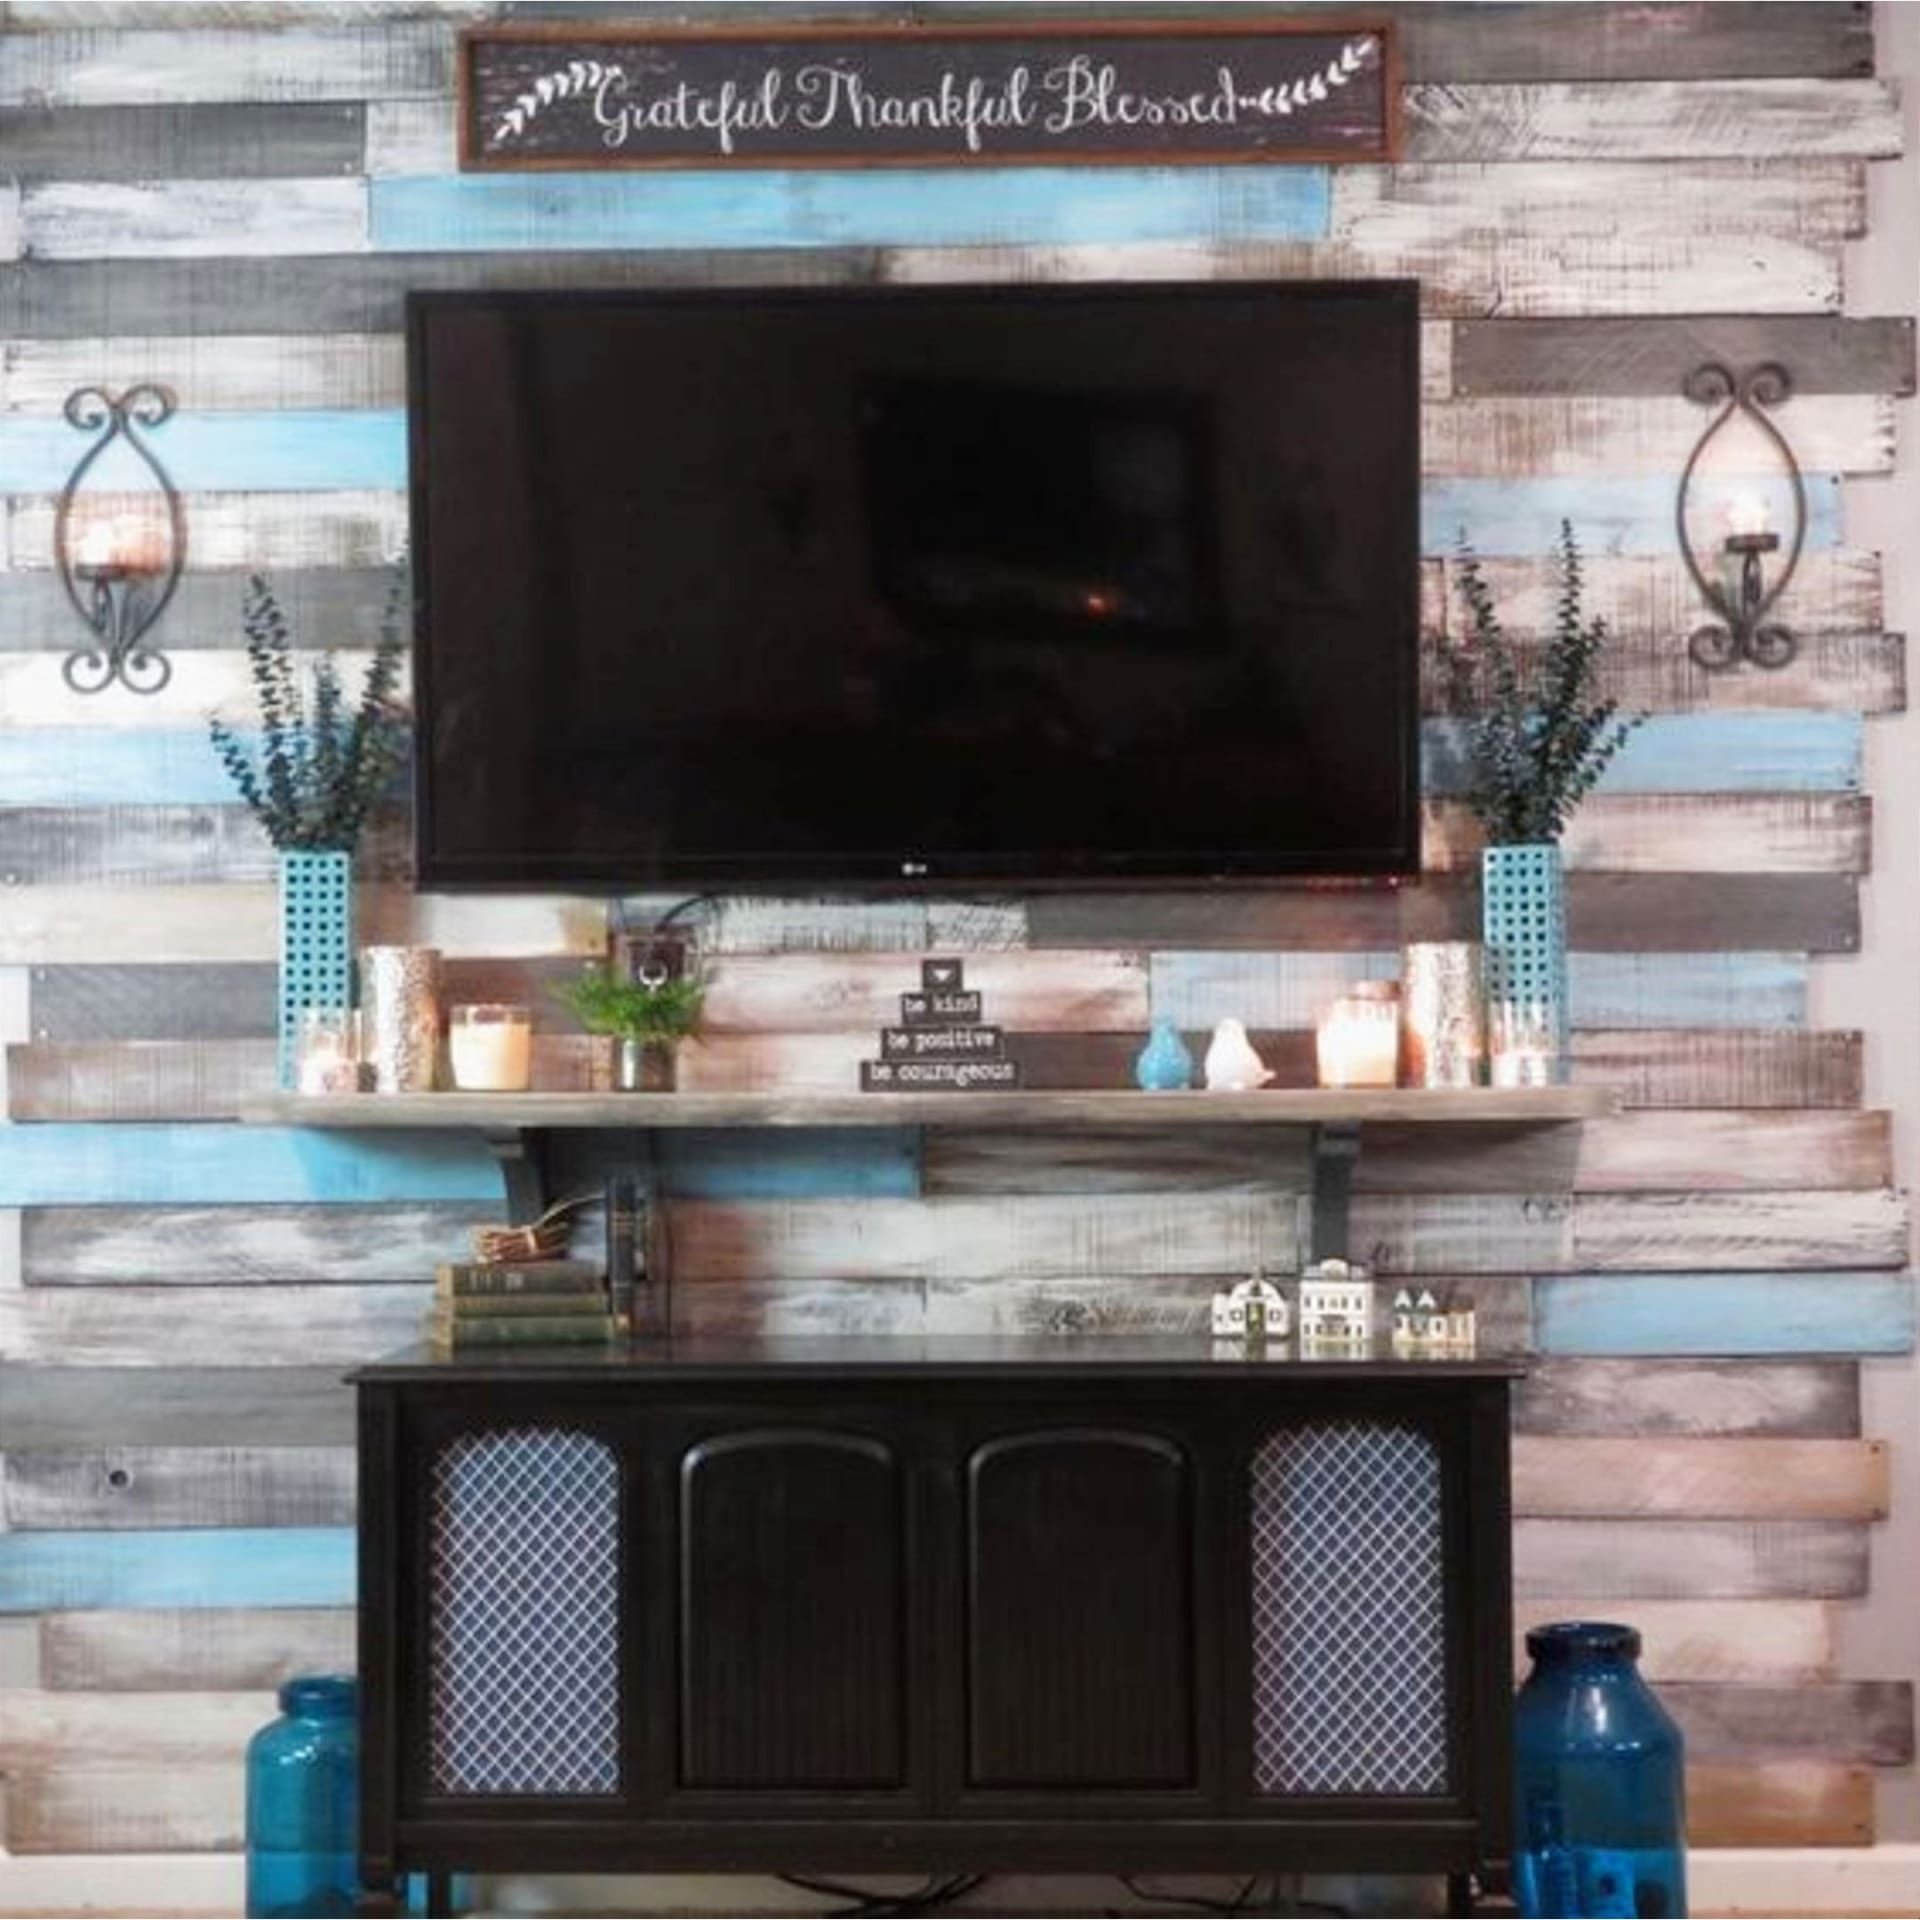 Cozy Neutral Living Room Ideas Earthy Gray Living Rooms To Copy Clever Diy Ideas Aqua Living Room Living Room Wall Color Accent Walls In Living Room #wall #color #for #small #living #room